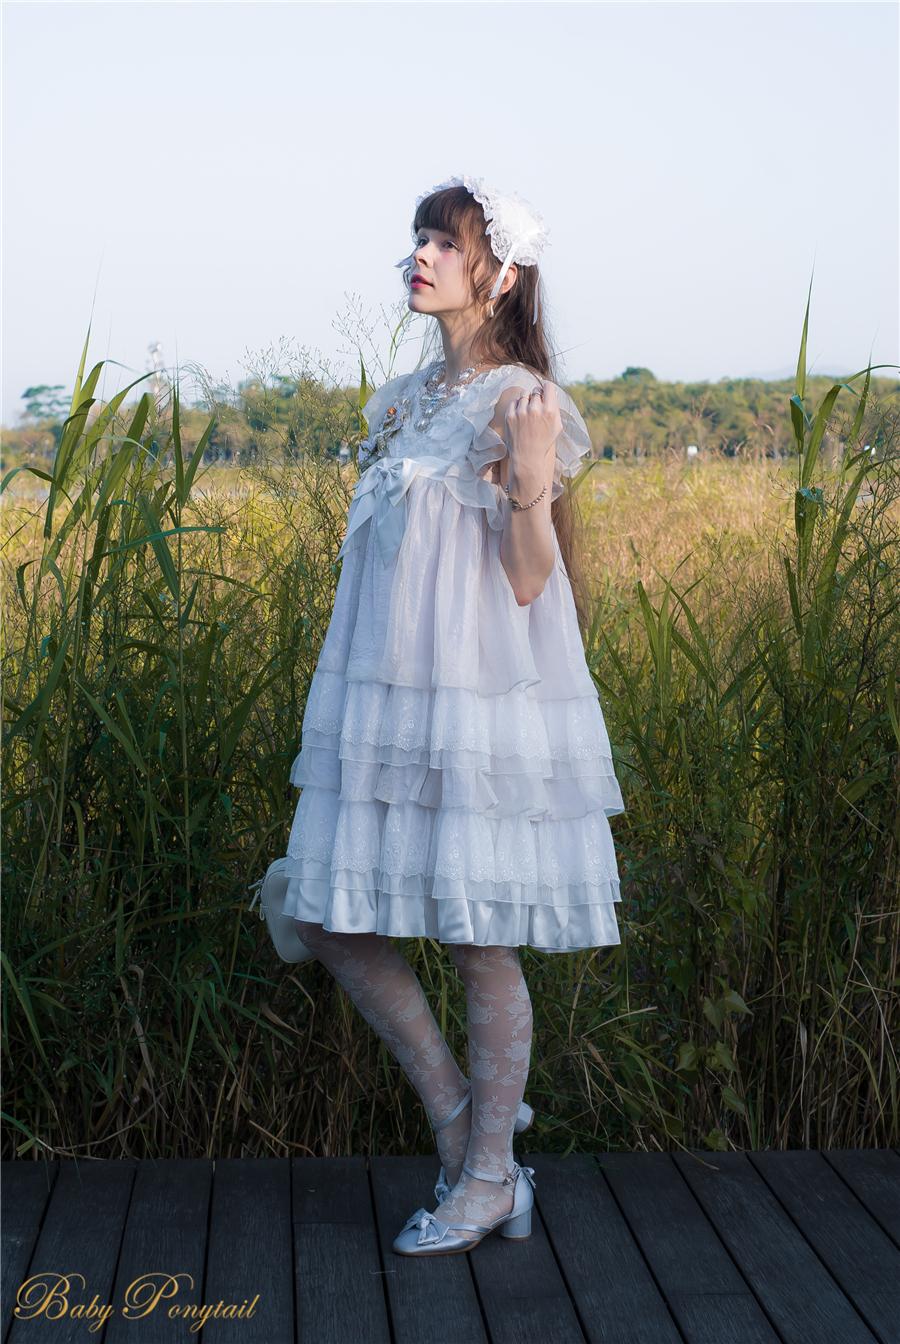 BabyPonytail_modelclaudia_Present Angel White JSK park06.jpg